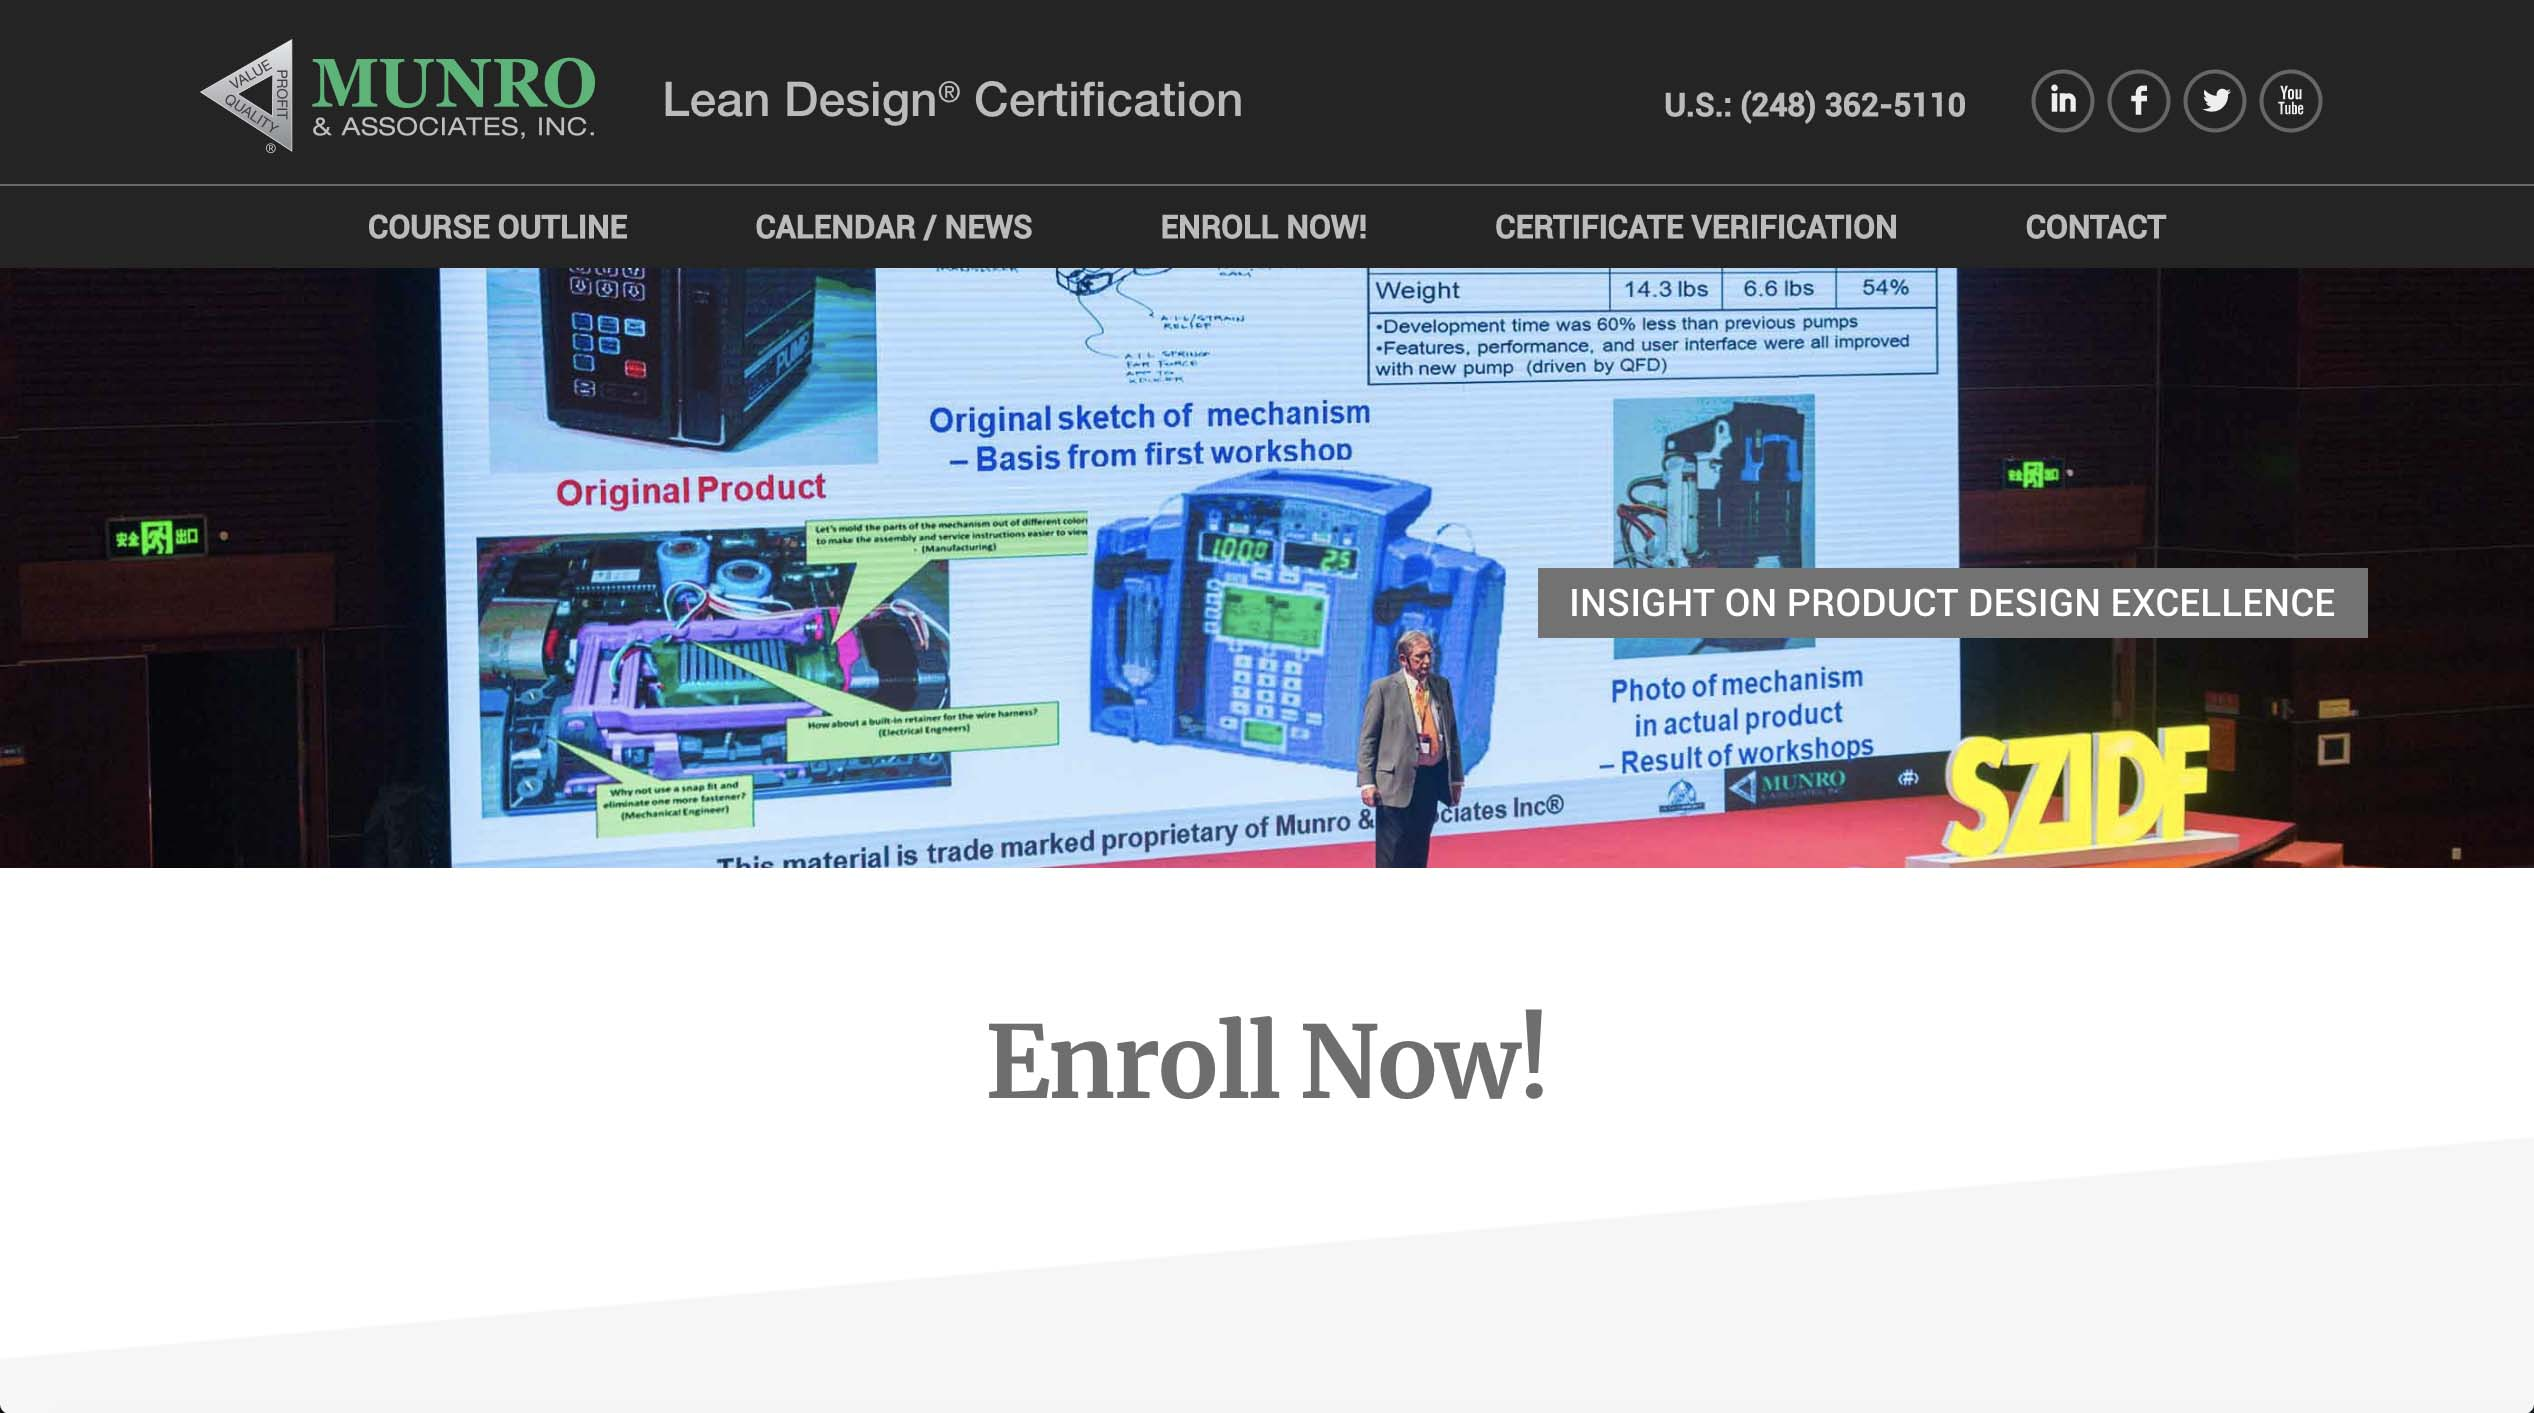 Lean Design Certification site